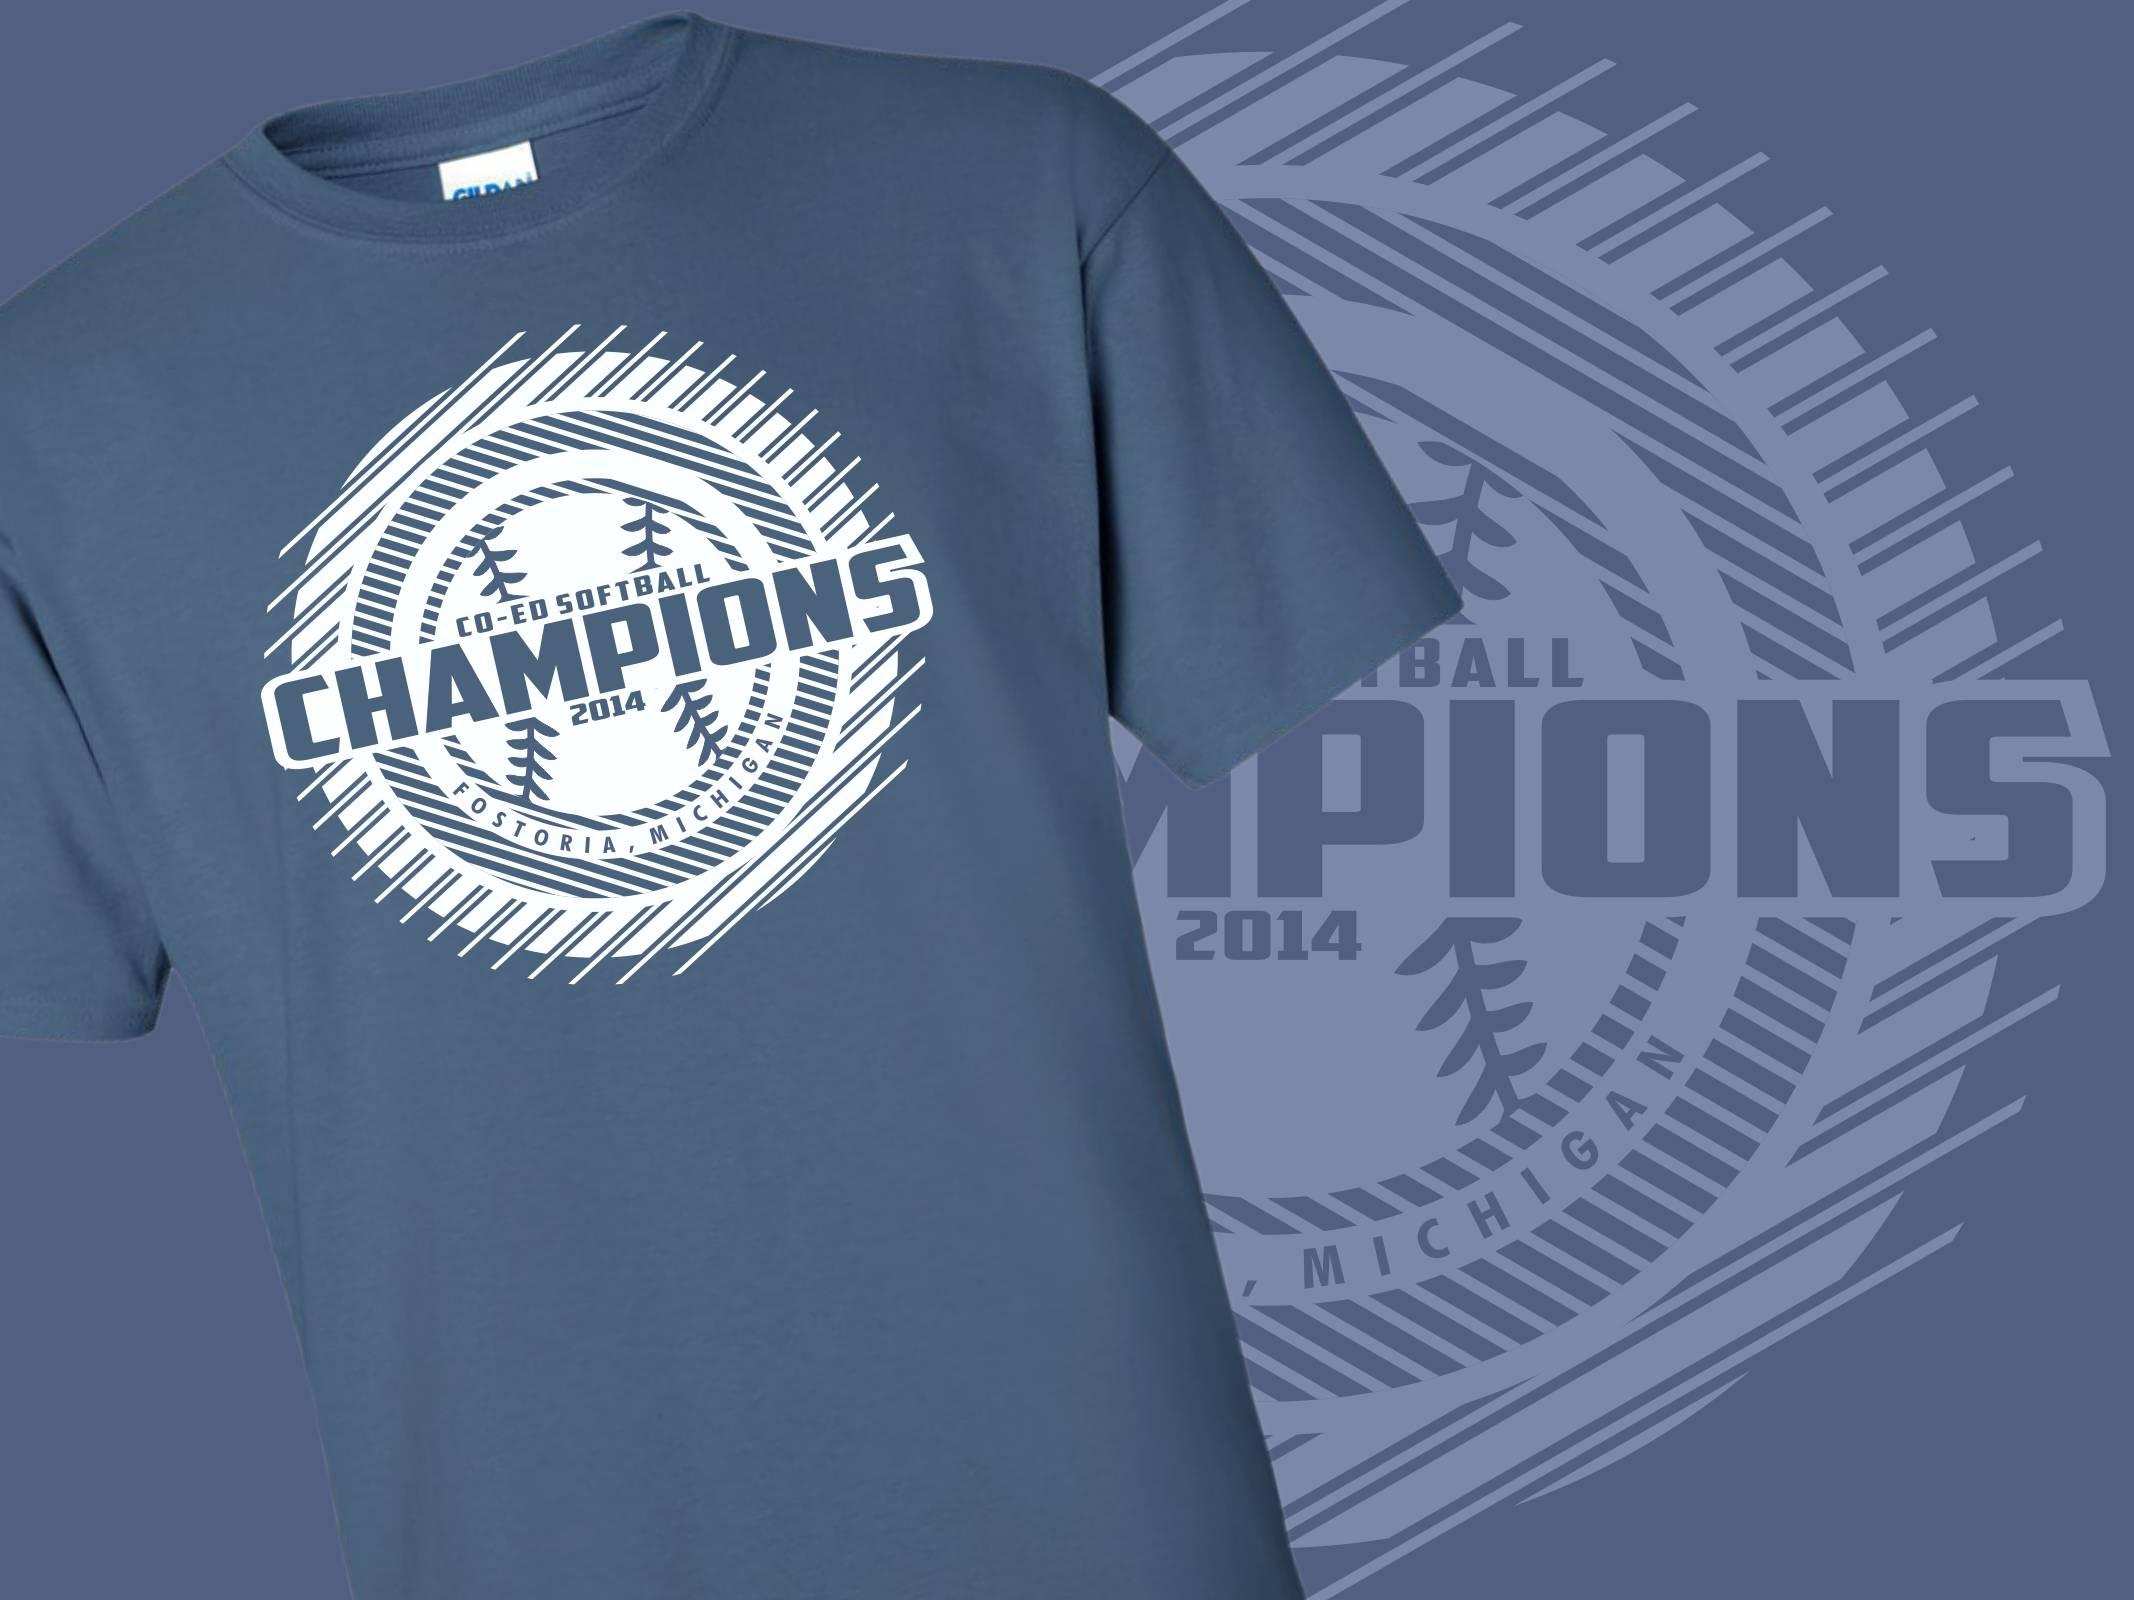 Co-Ed Softball Champions